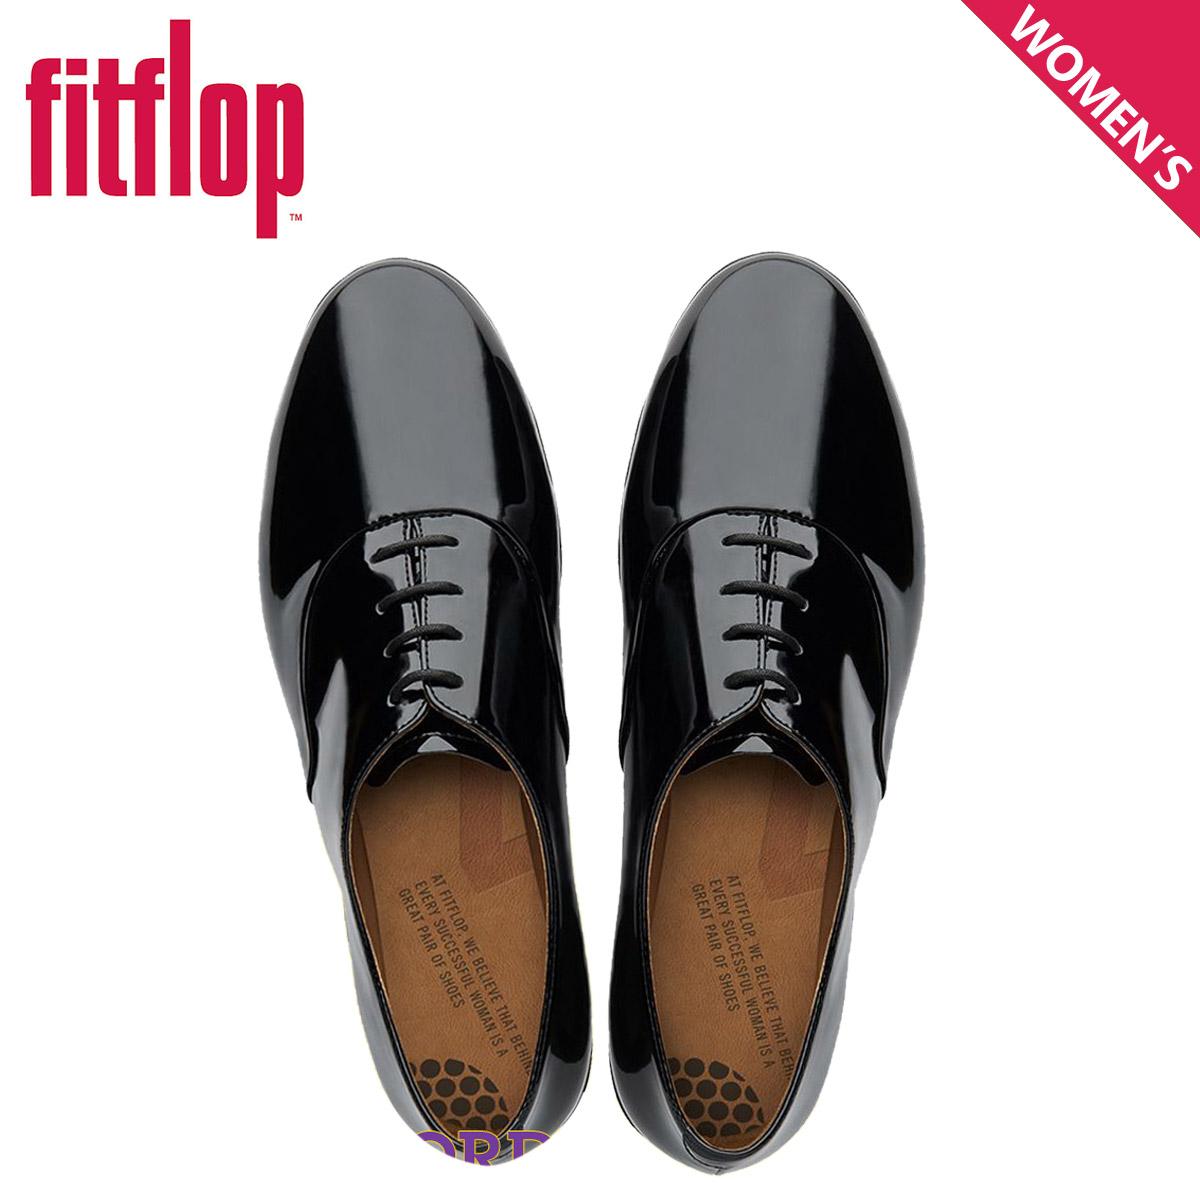 175e31d8491d ALLSPORTS  Fit flops FitFlop Oxford Shoes F-POP OXFORD PATENT 437 ladies